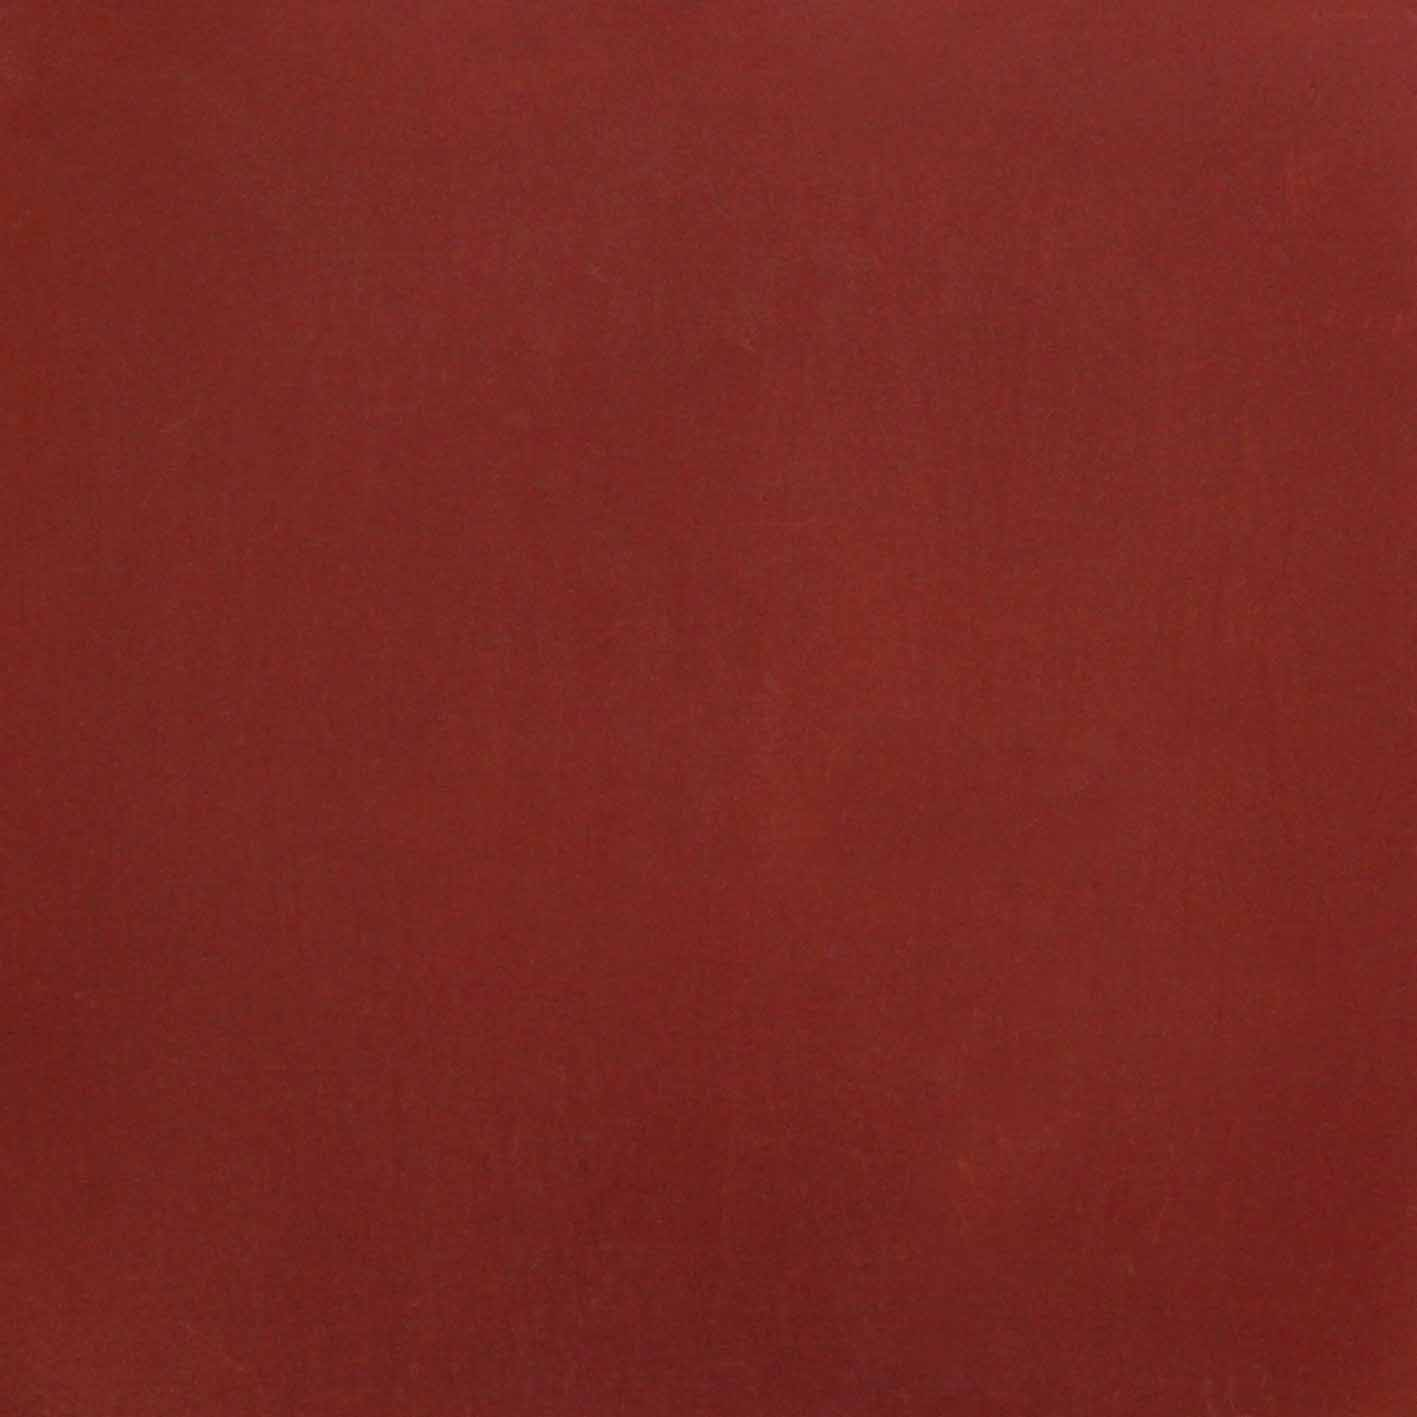 Cement floor tile castillo von replicata unicoloured dark red general product information dailygadgetfo Choice Image